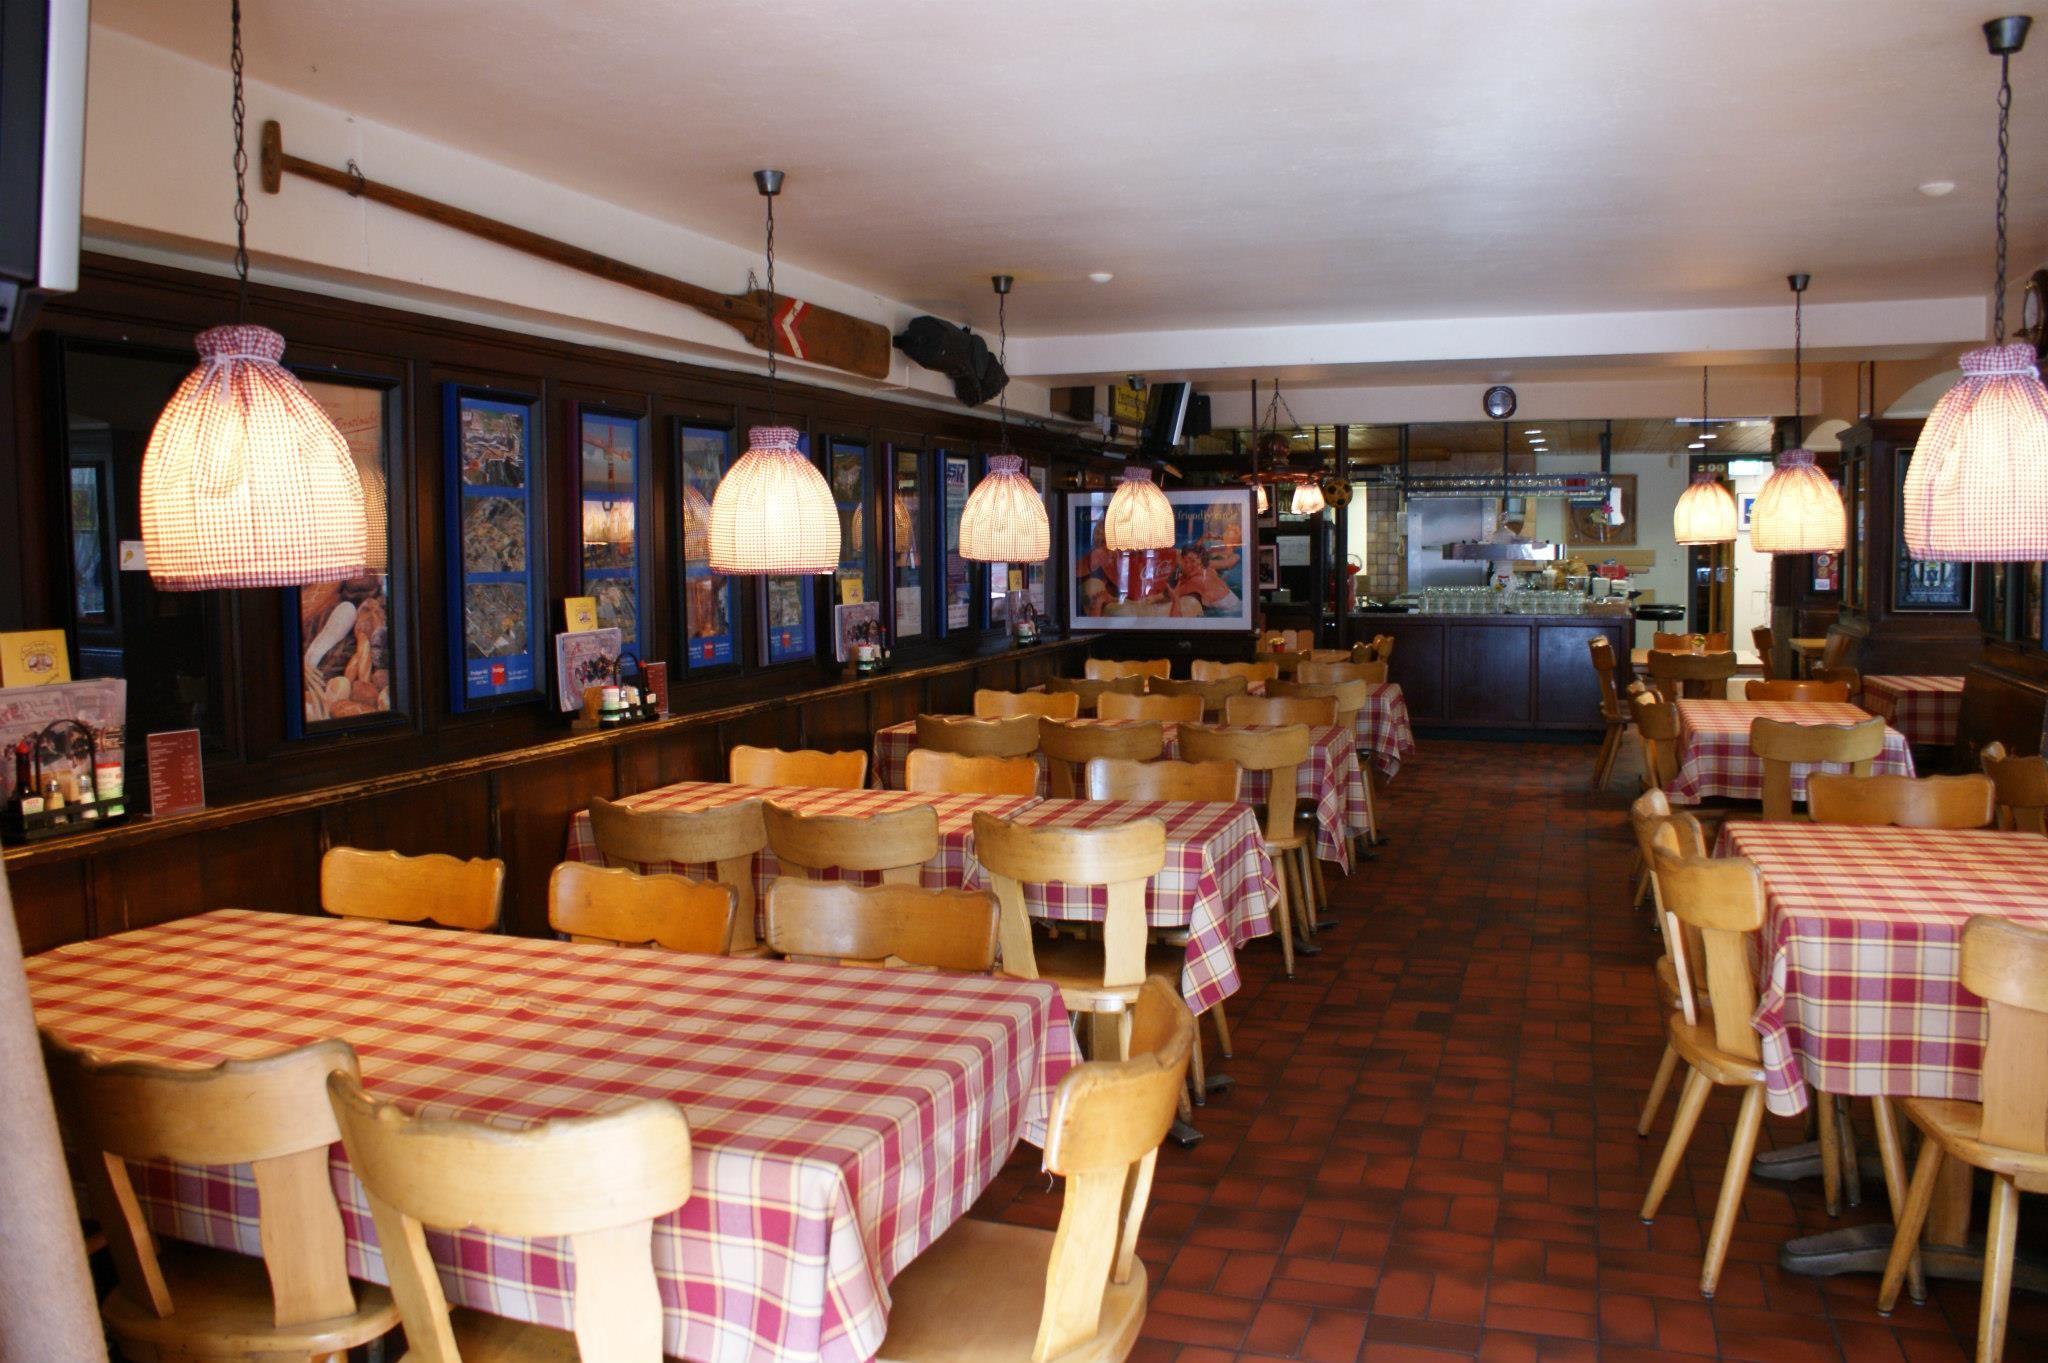 Restaurant Anker Bern Brasserie Speisekarte Hausspezialitaten